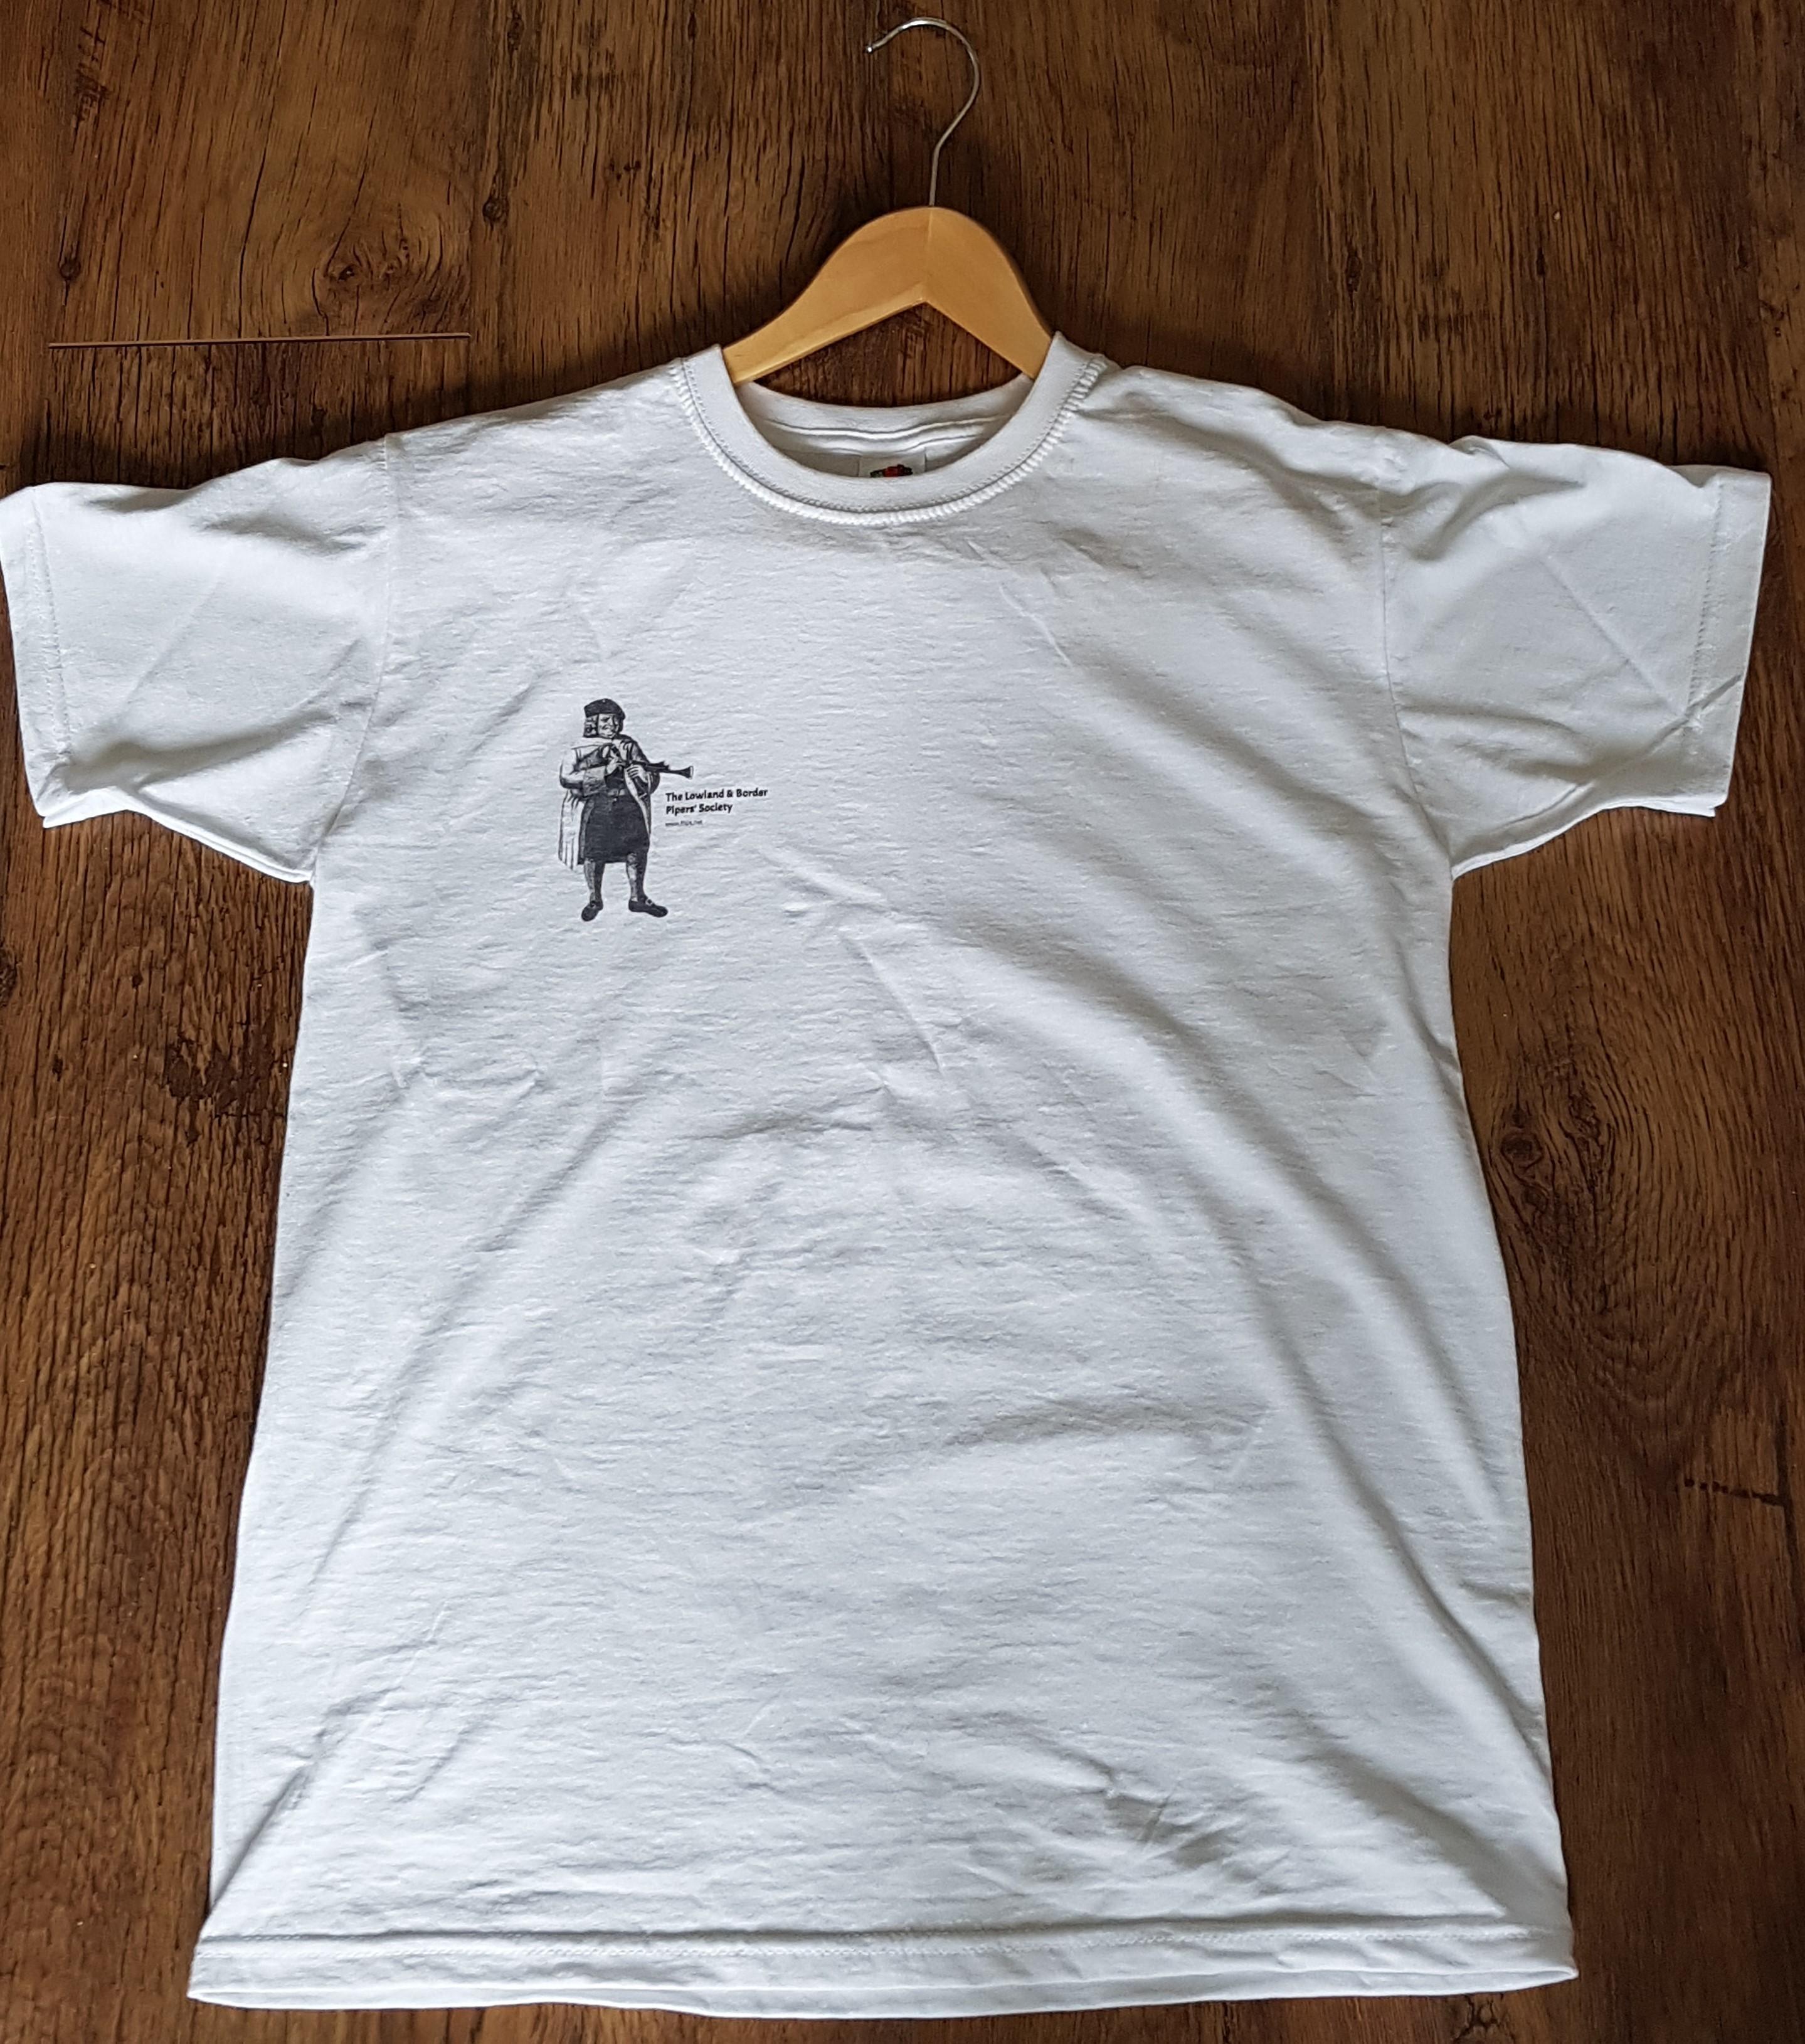 LBPS T shirt